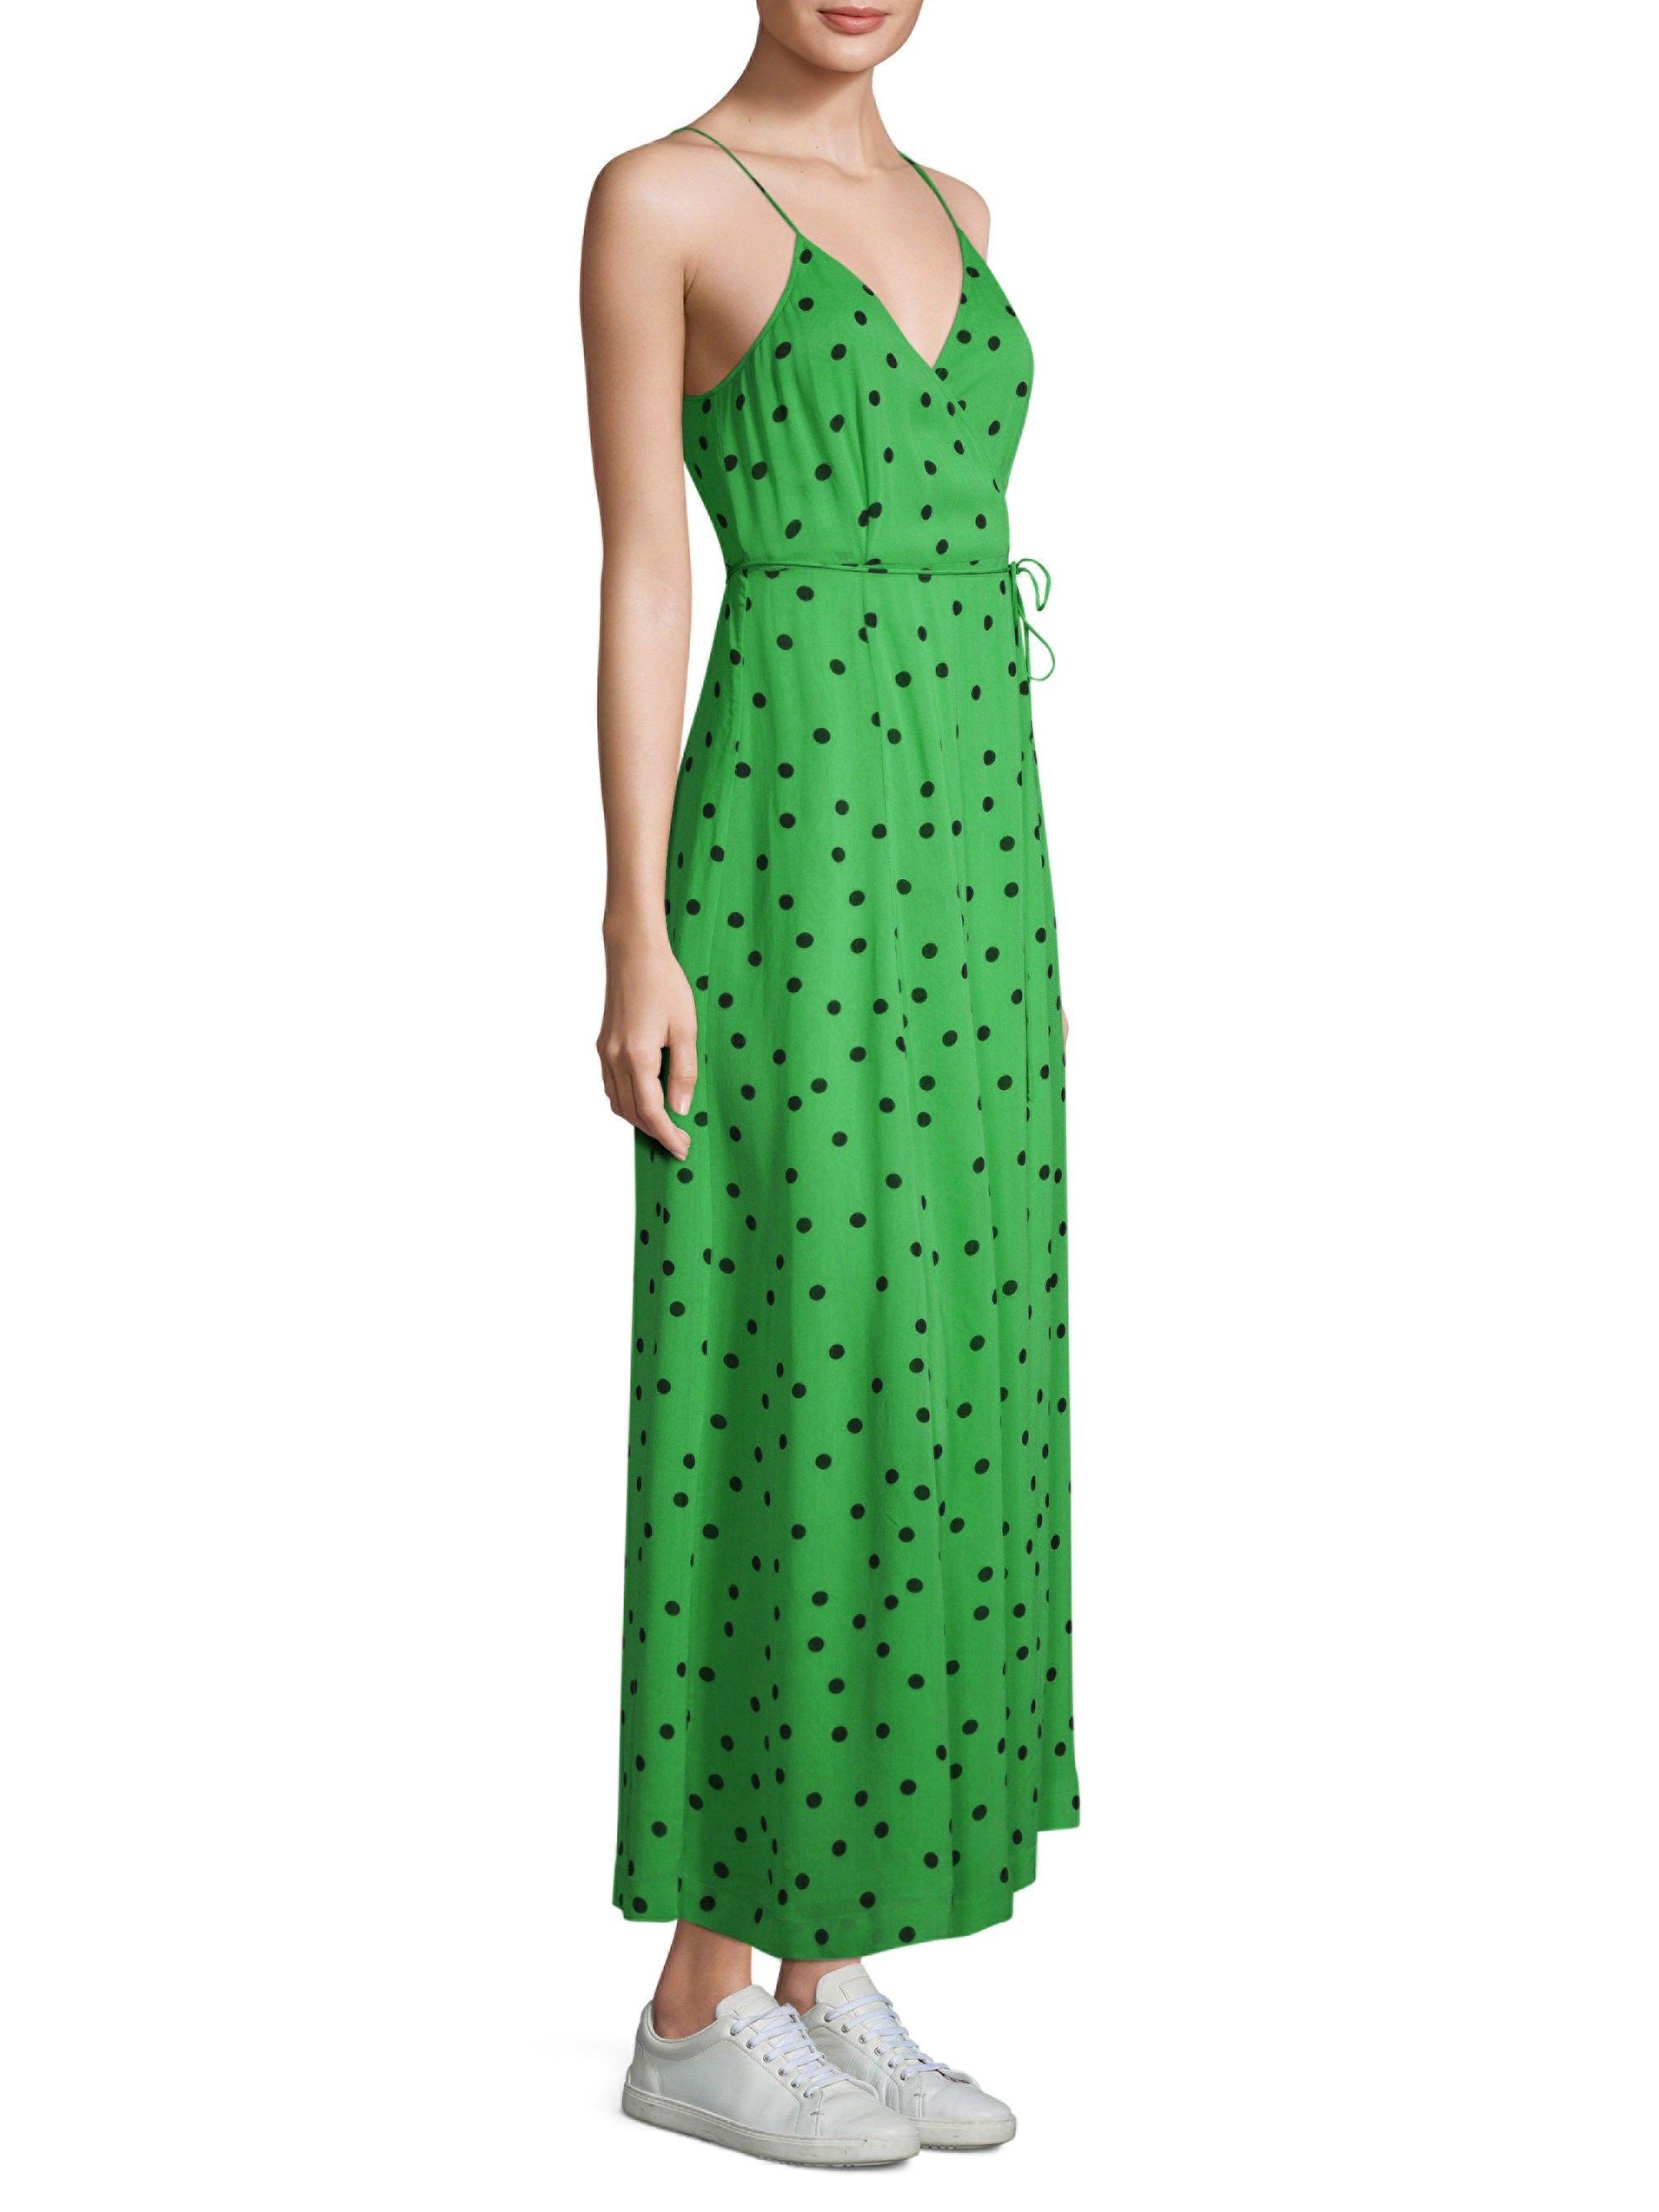 e2ee563e08d Ganni Dainty Georgette Polka Dot Dress - Classic Green 36 (4 ...